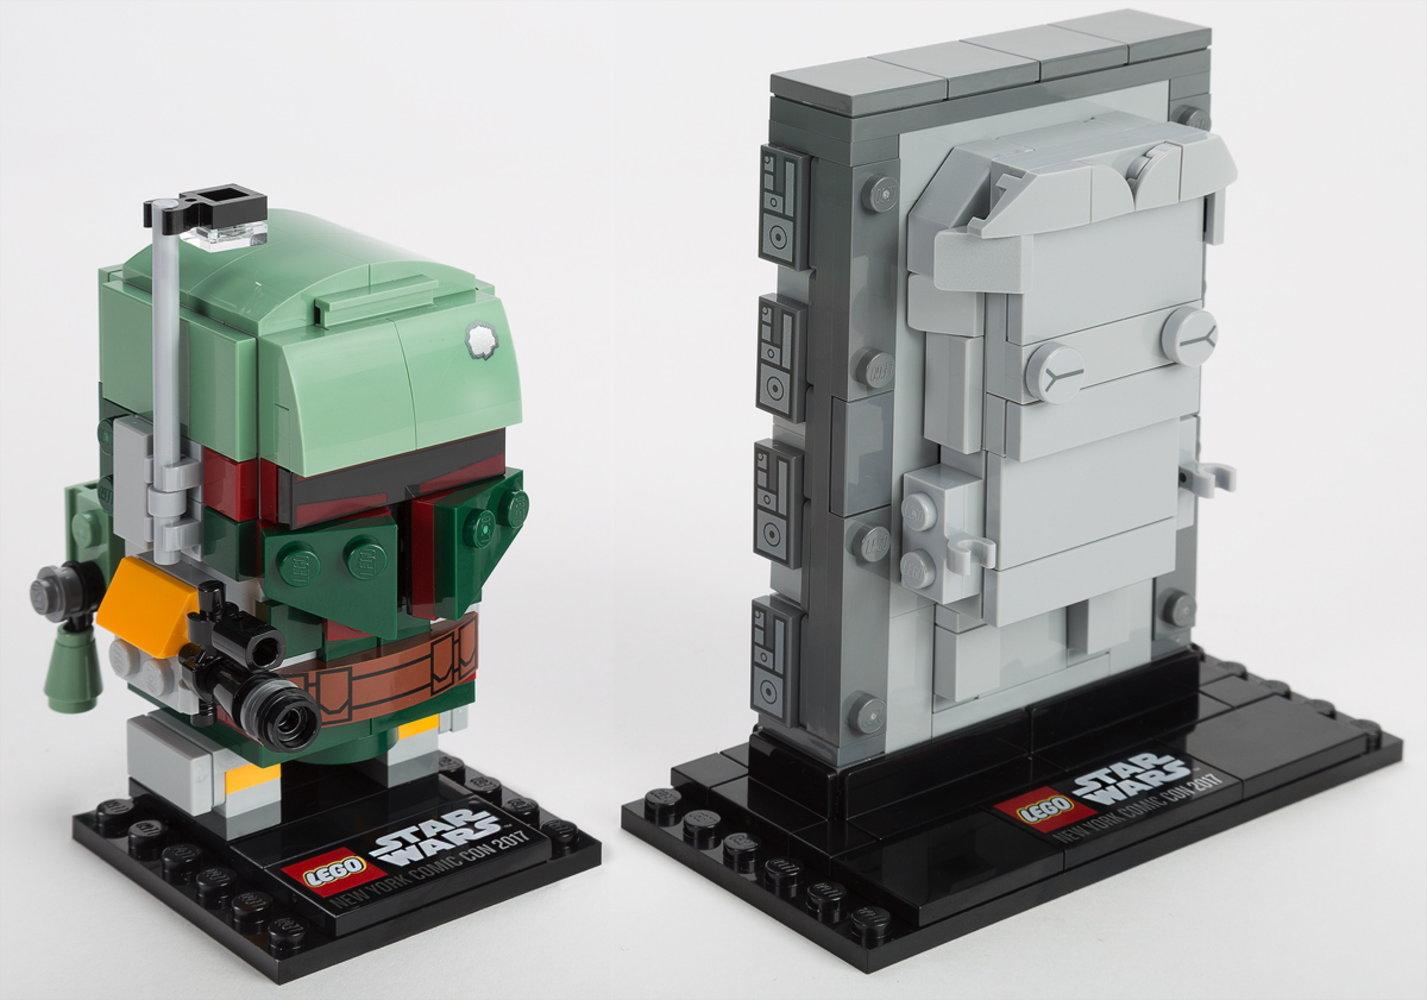 Boba Fett & Han Solo in Carbonite